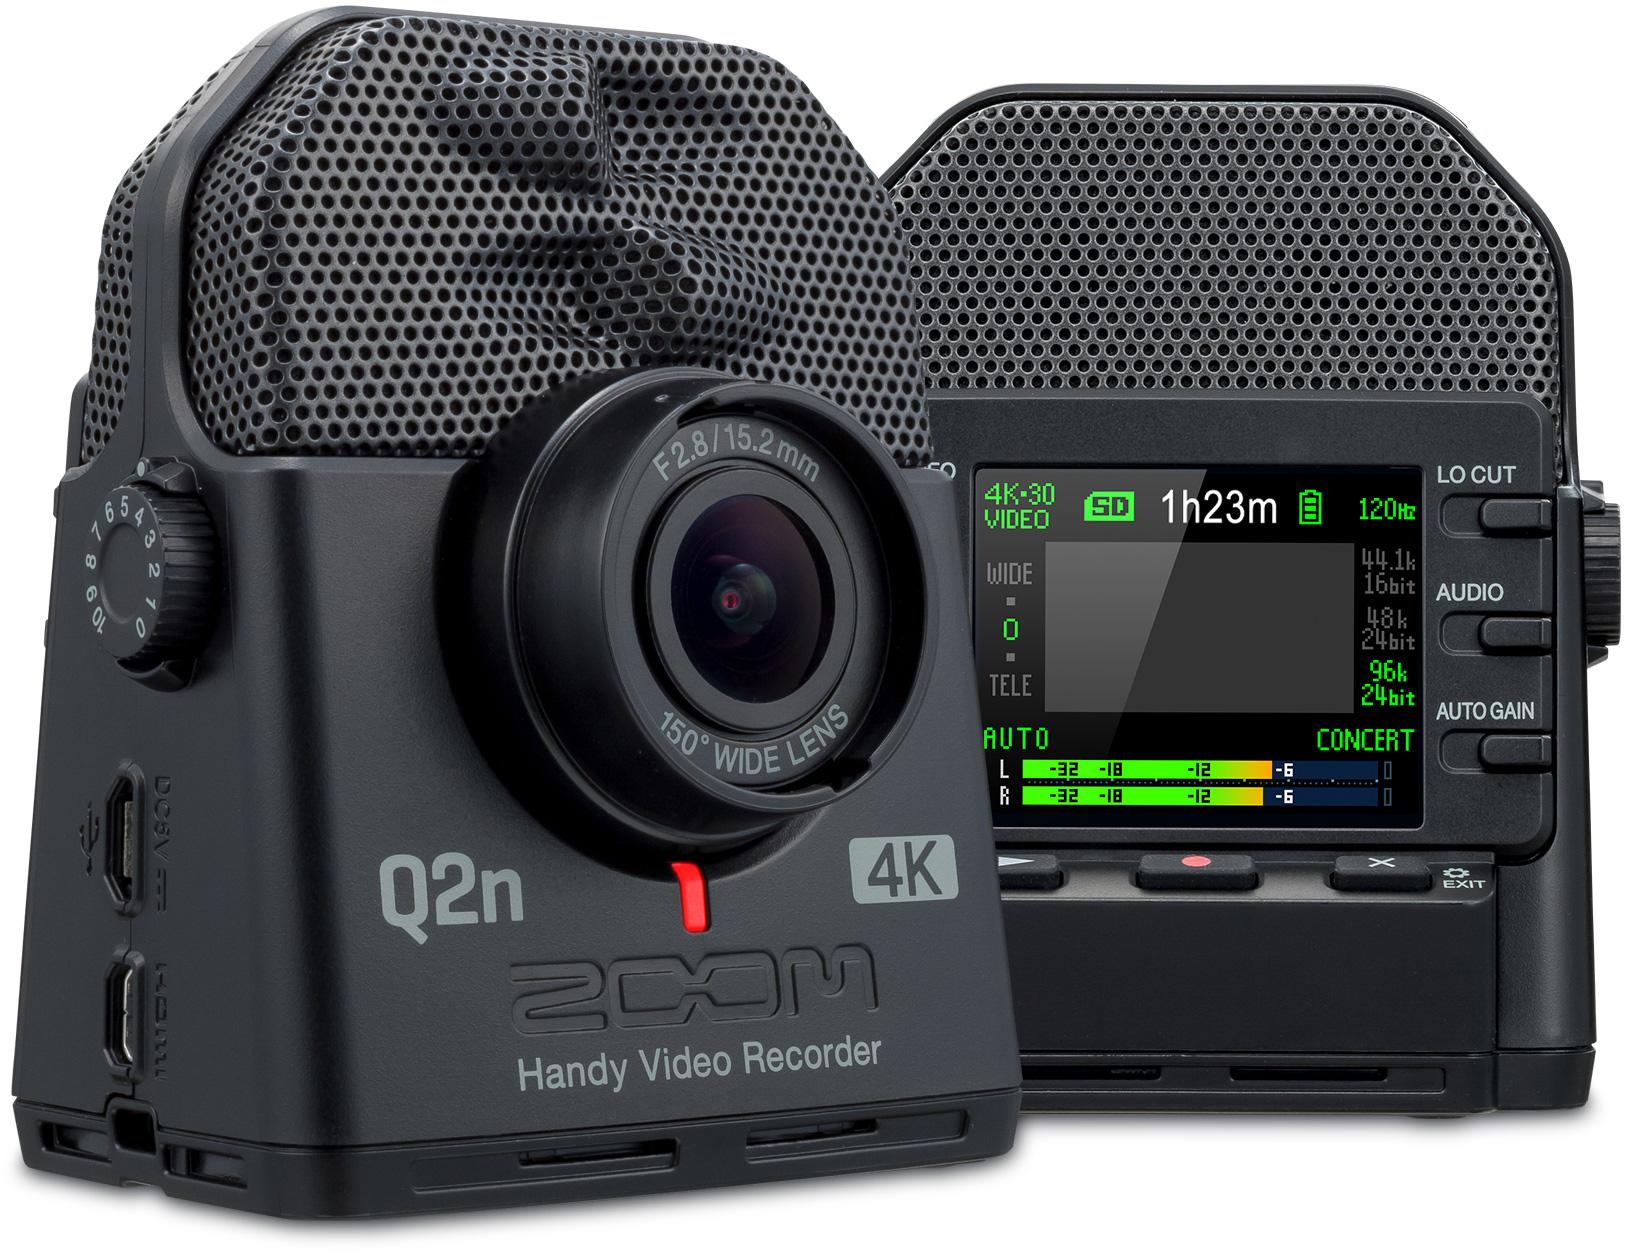 Zoom Q2n 4k Ultra High Definition Handy Video Recorder